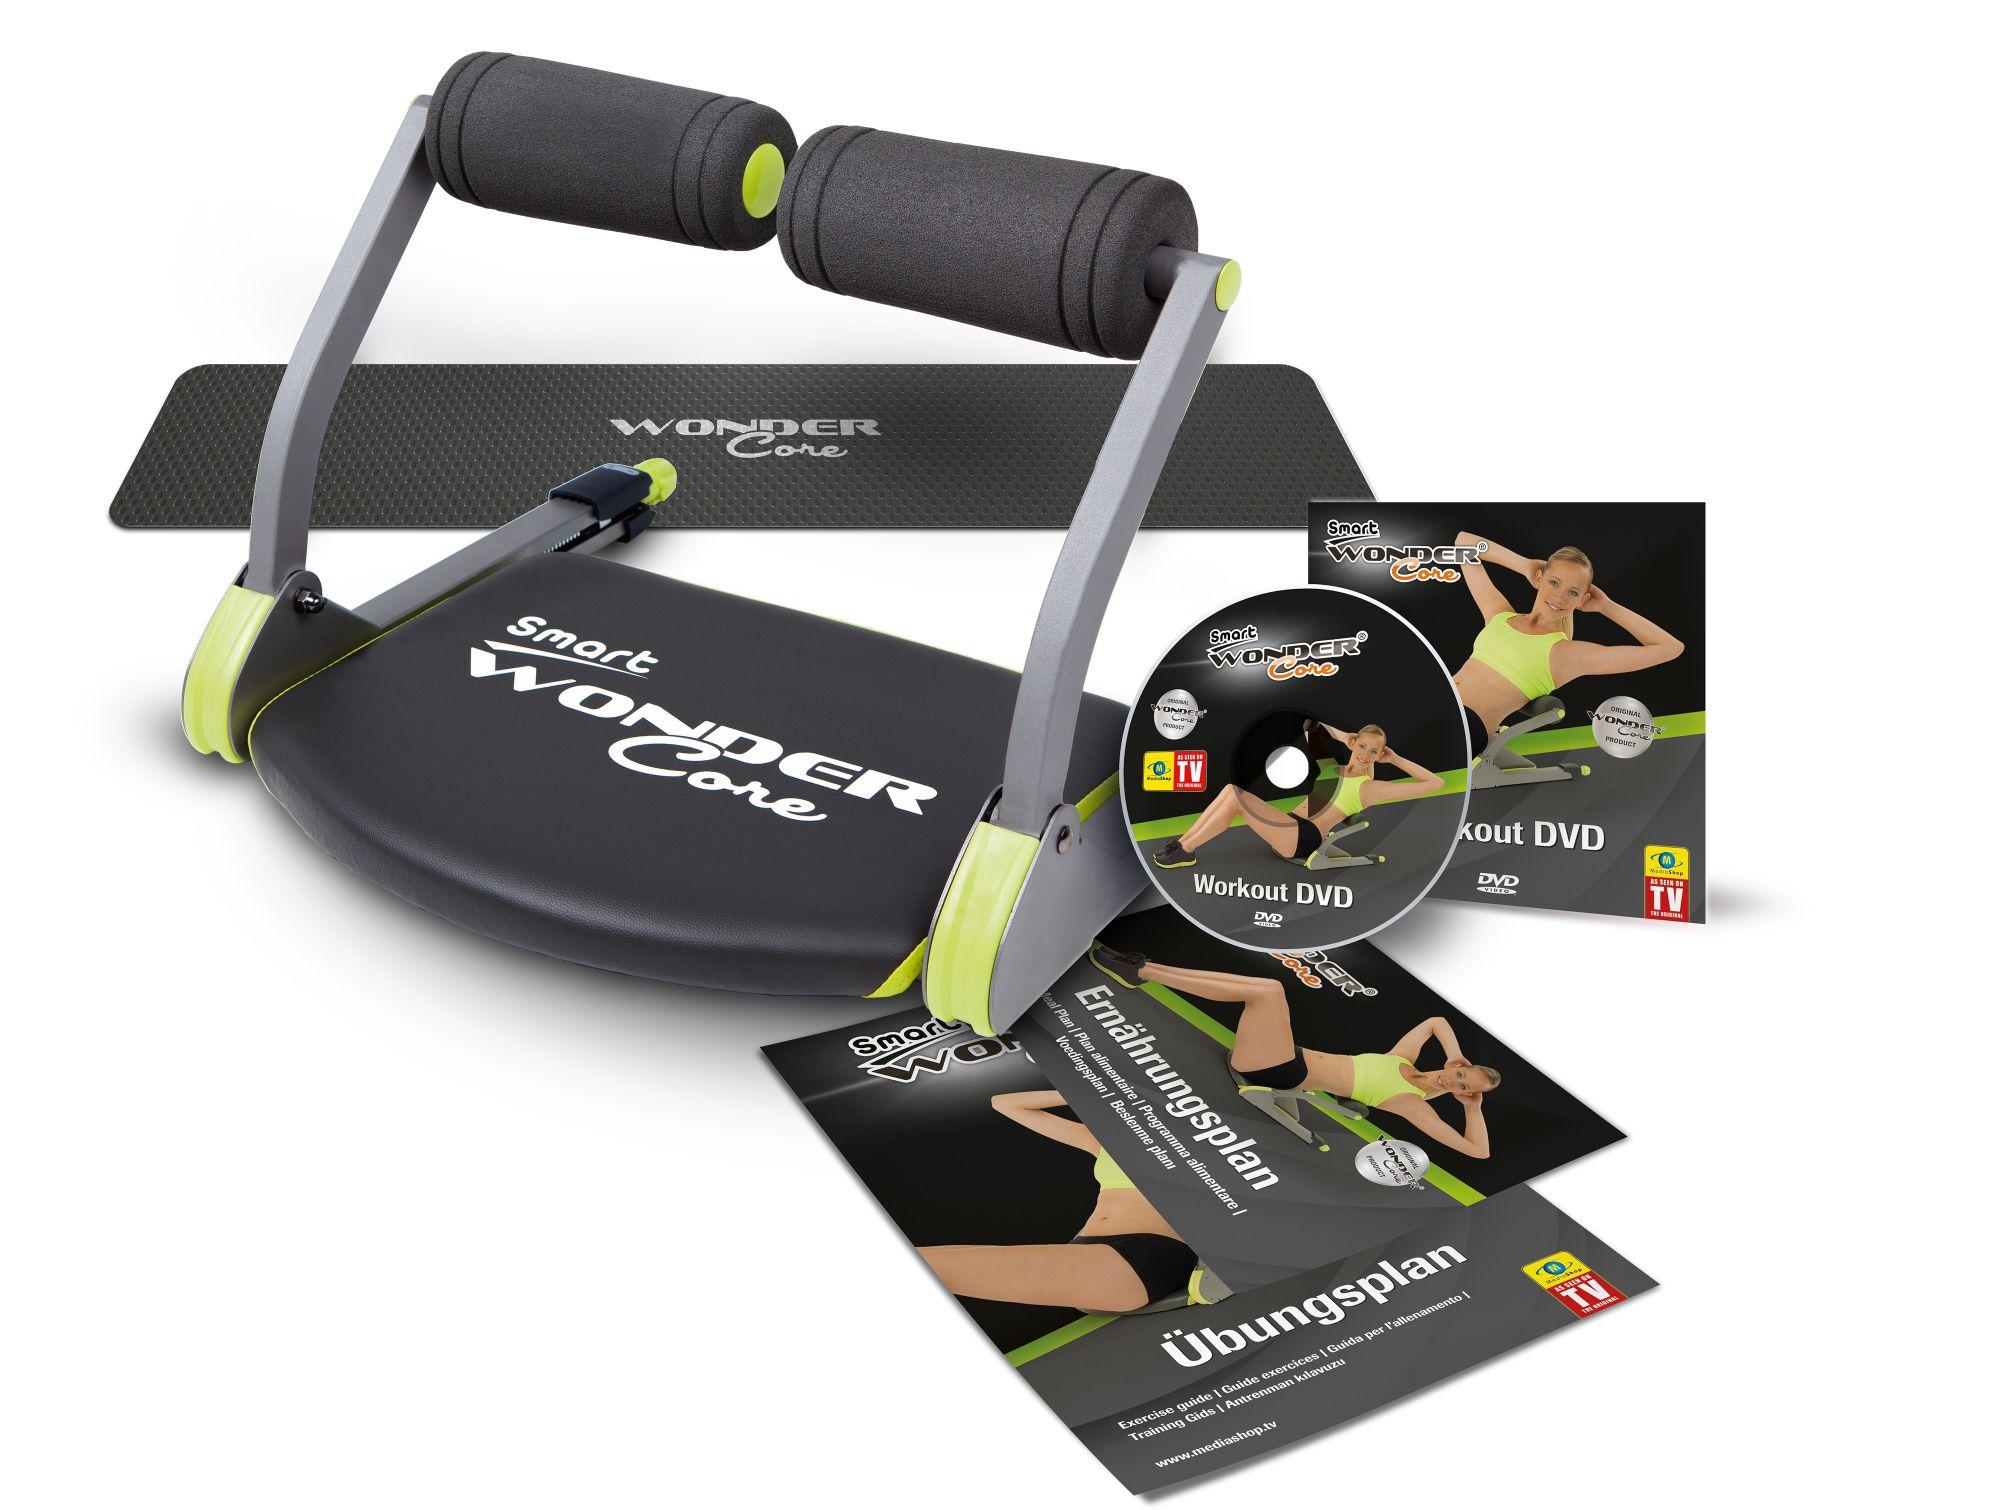 bauch beine po im schwab online shop sport fitnessger te. Black Bedroom Furniture Sets. Home Design Ideas